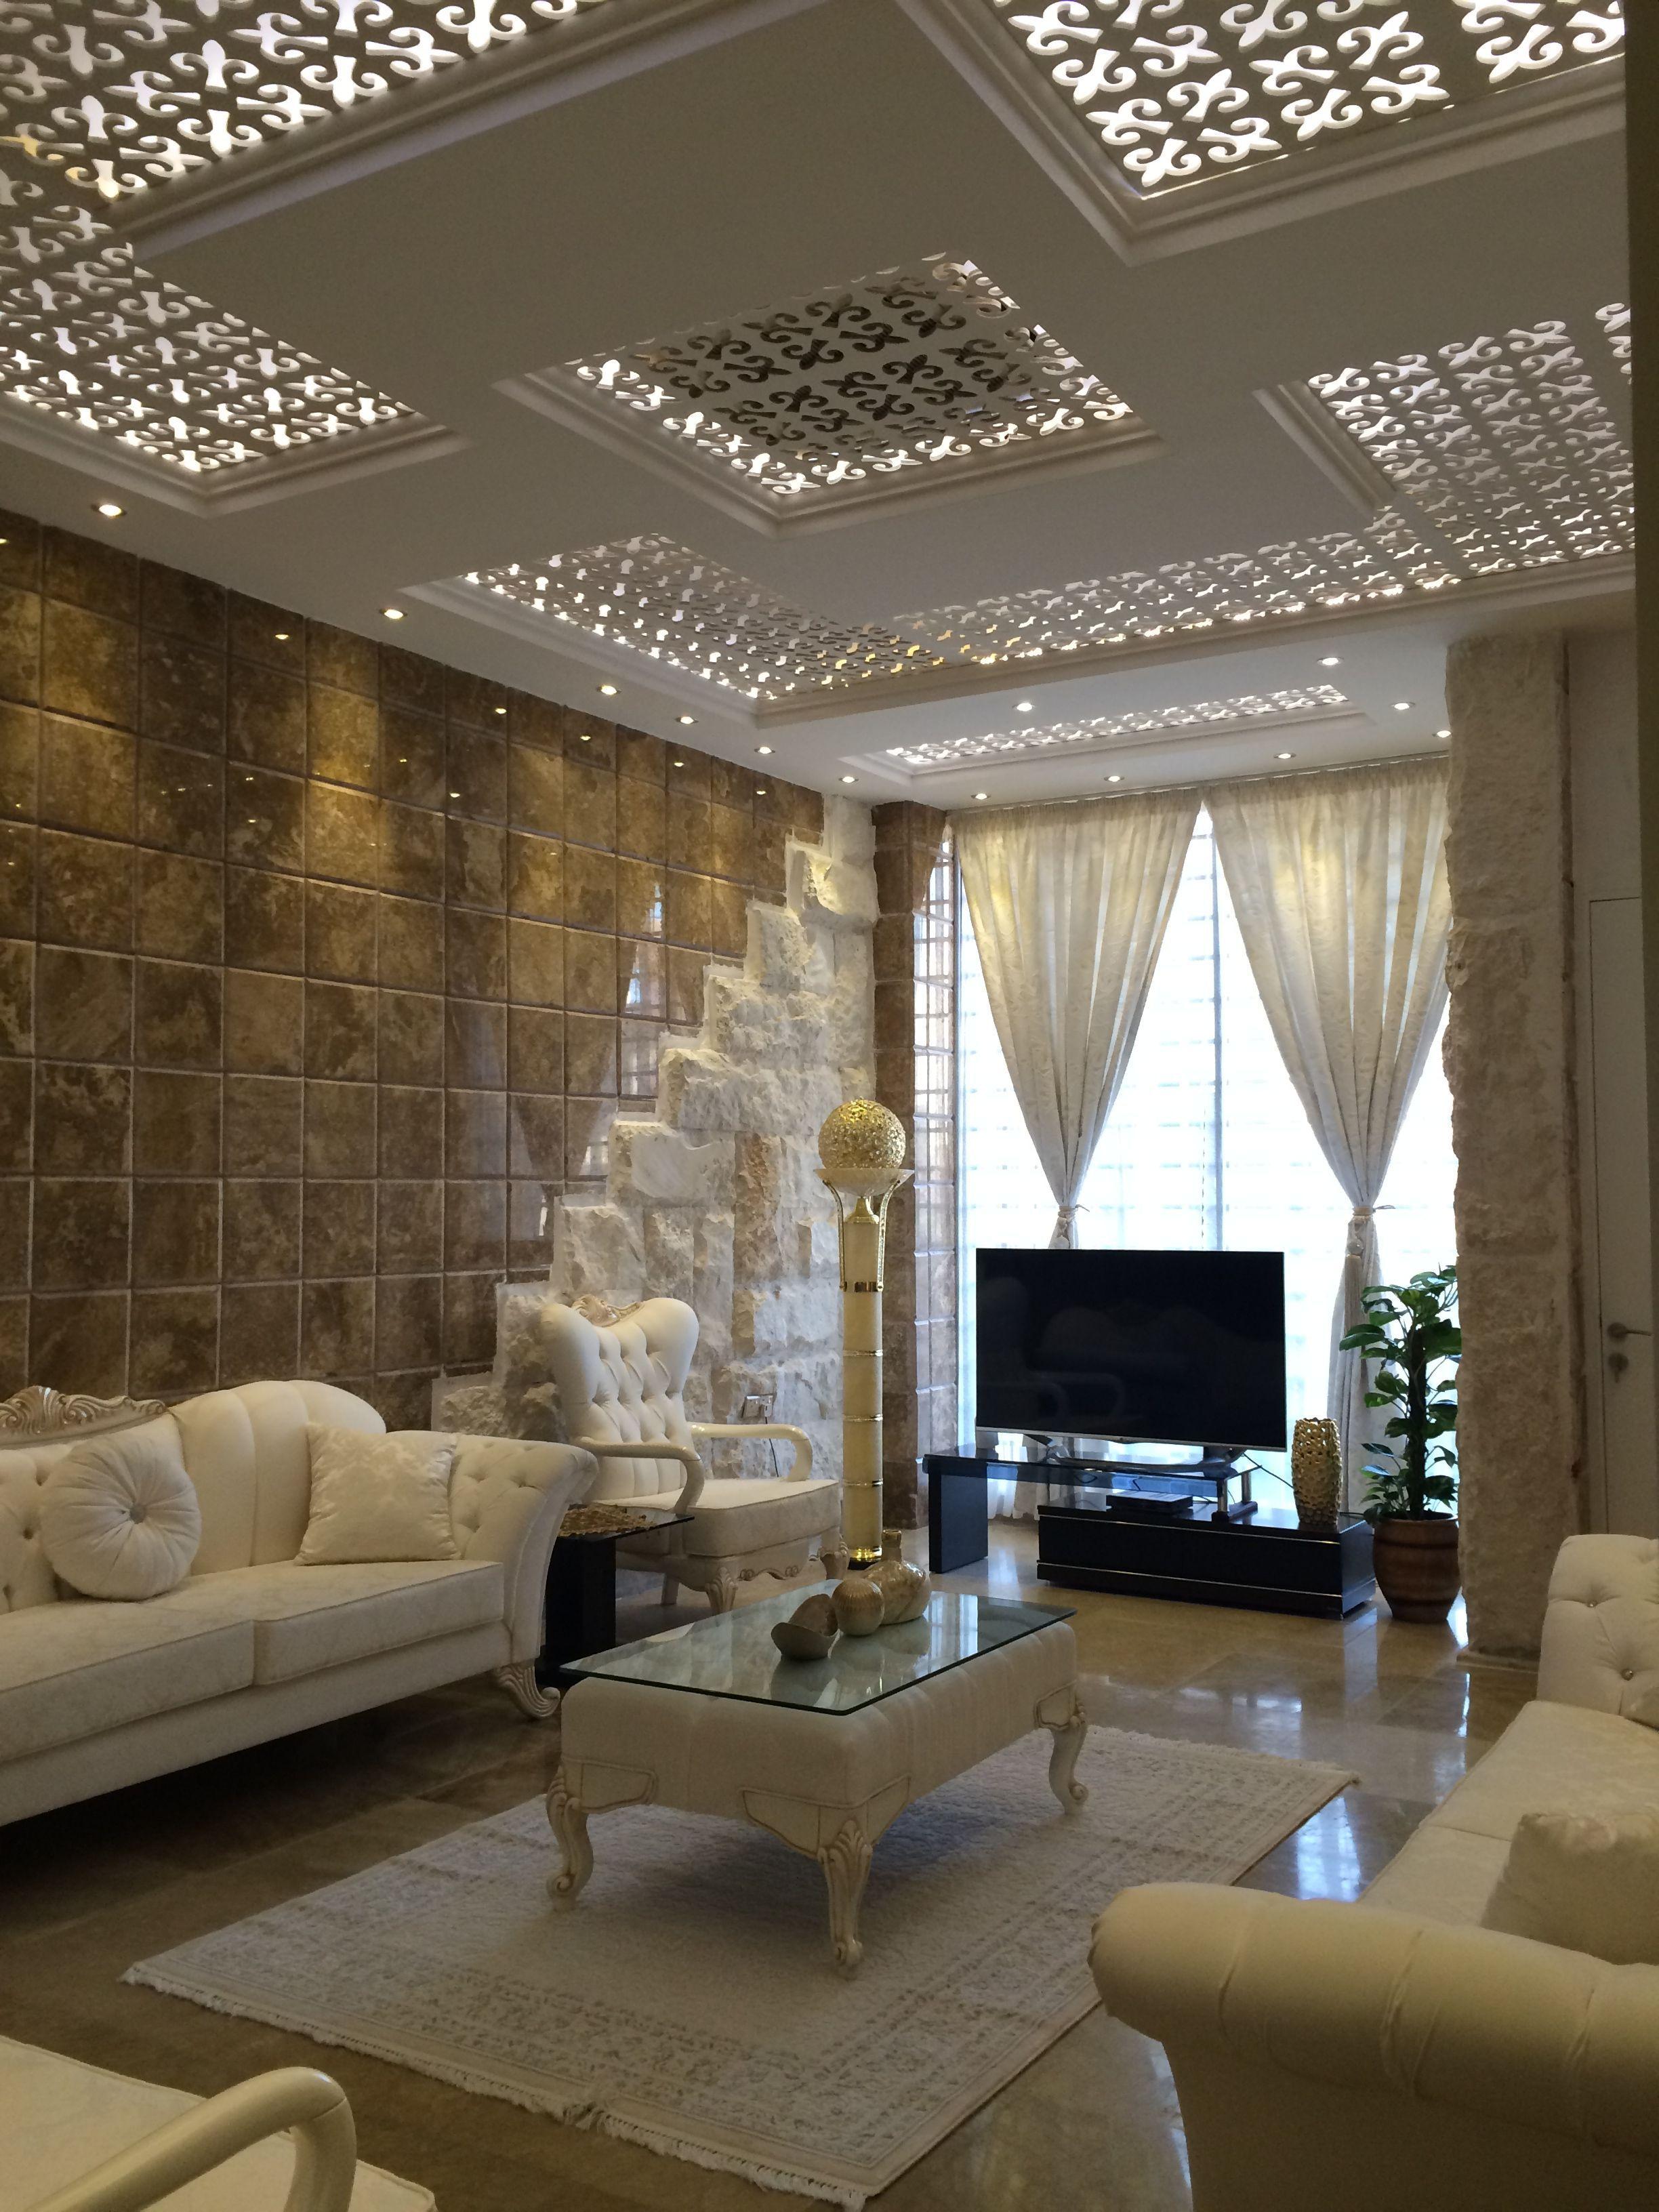 Basement ceiling insulation options ideas drop also best drawing living room good design pinterest rh